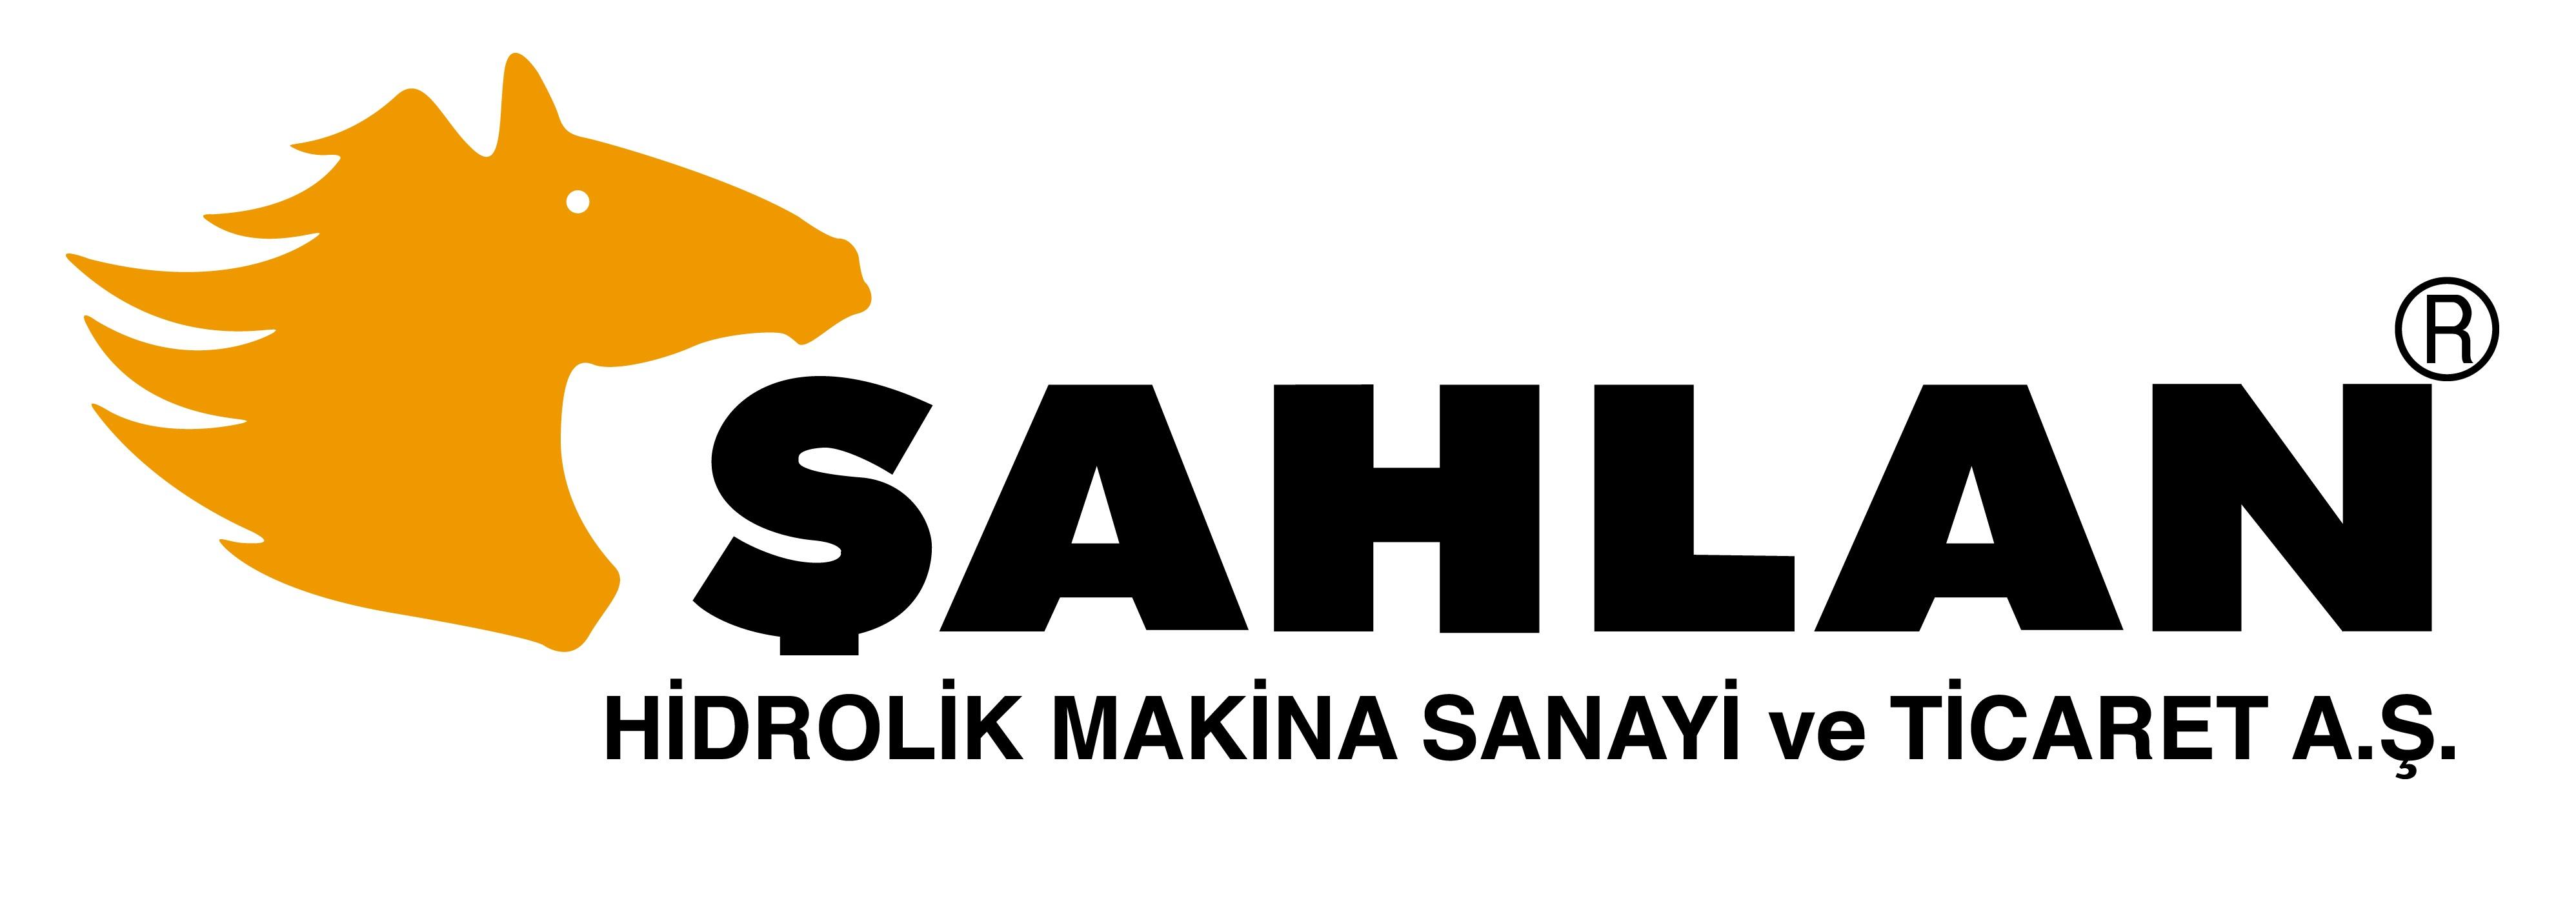 Şahlan Hidrolik Mak. San. ve Tic. A.Ş.